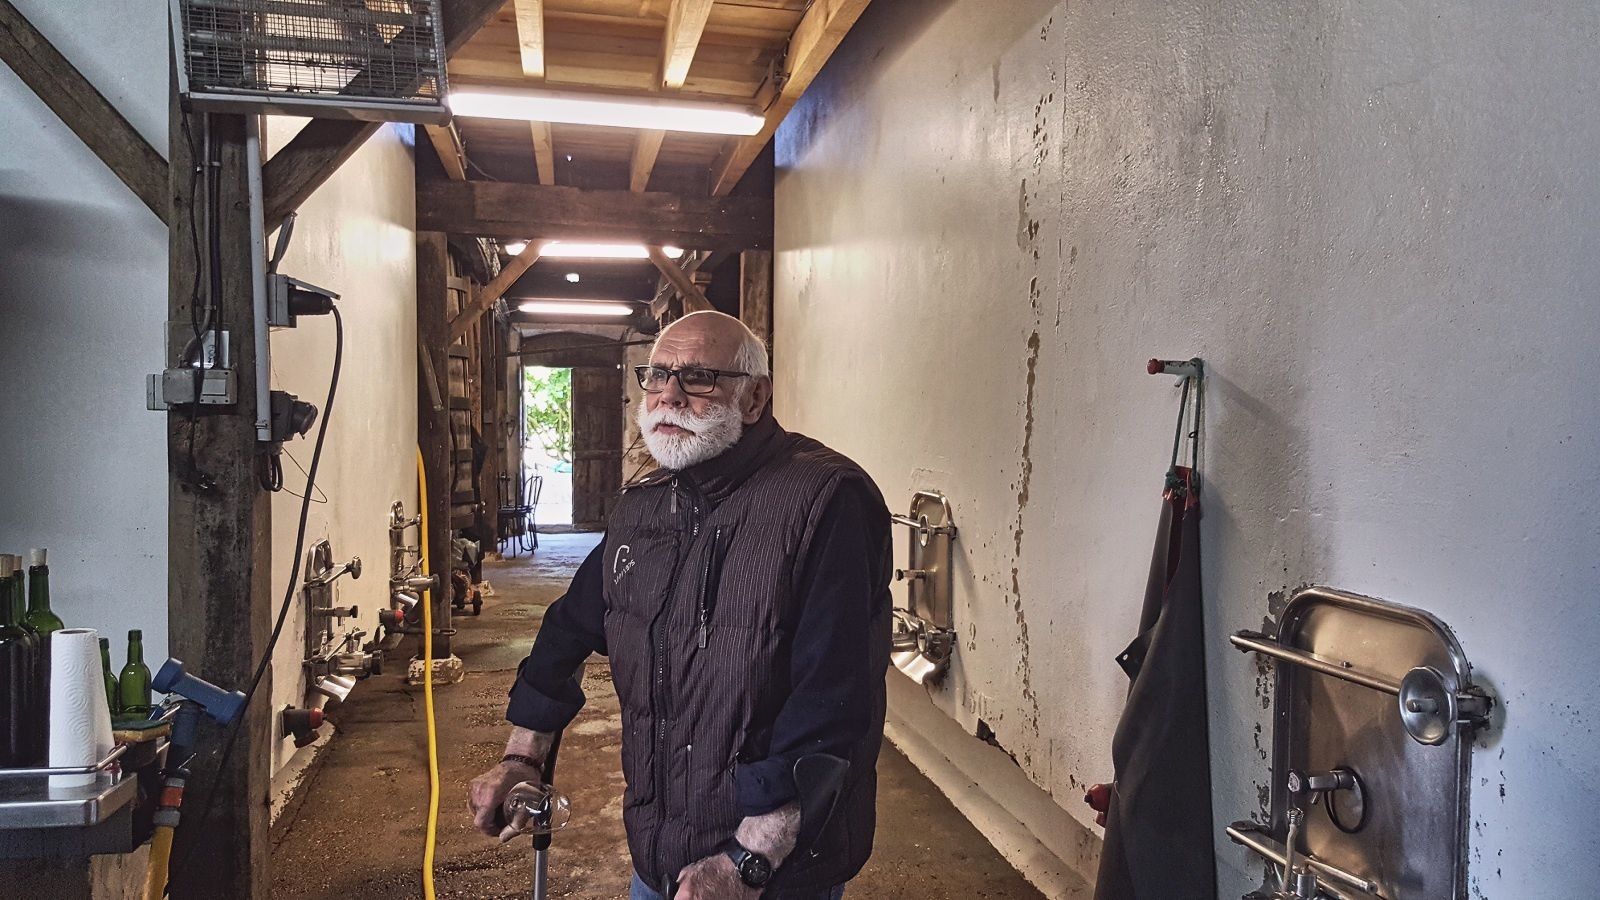 Adrien Tramier, vigneron à Bégadan au château Saint Saturnin ©EmmanuelDelmas